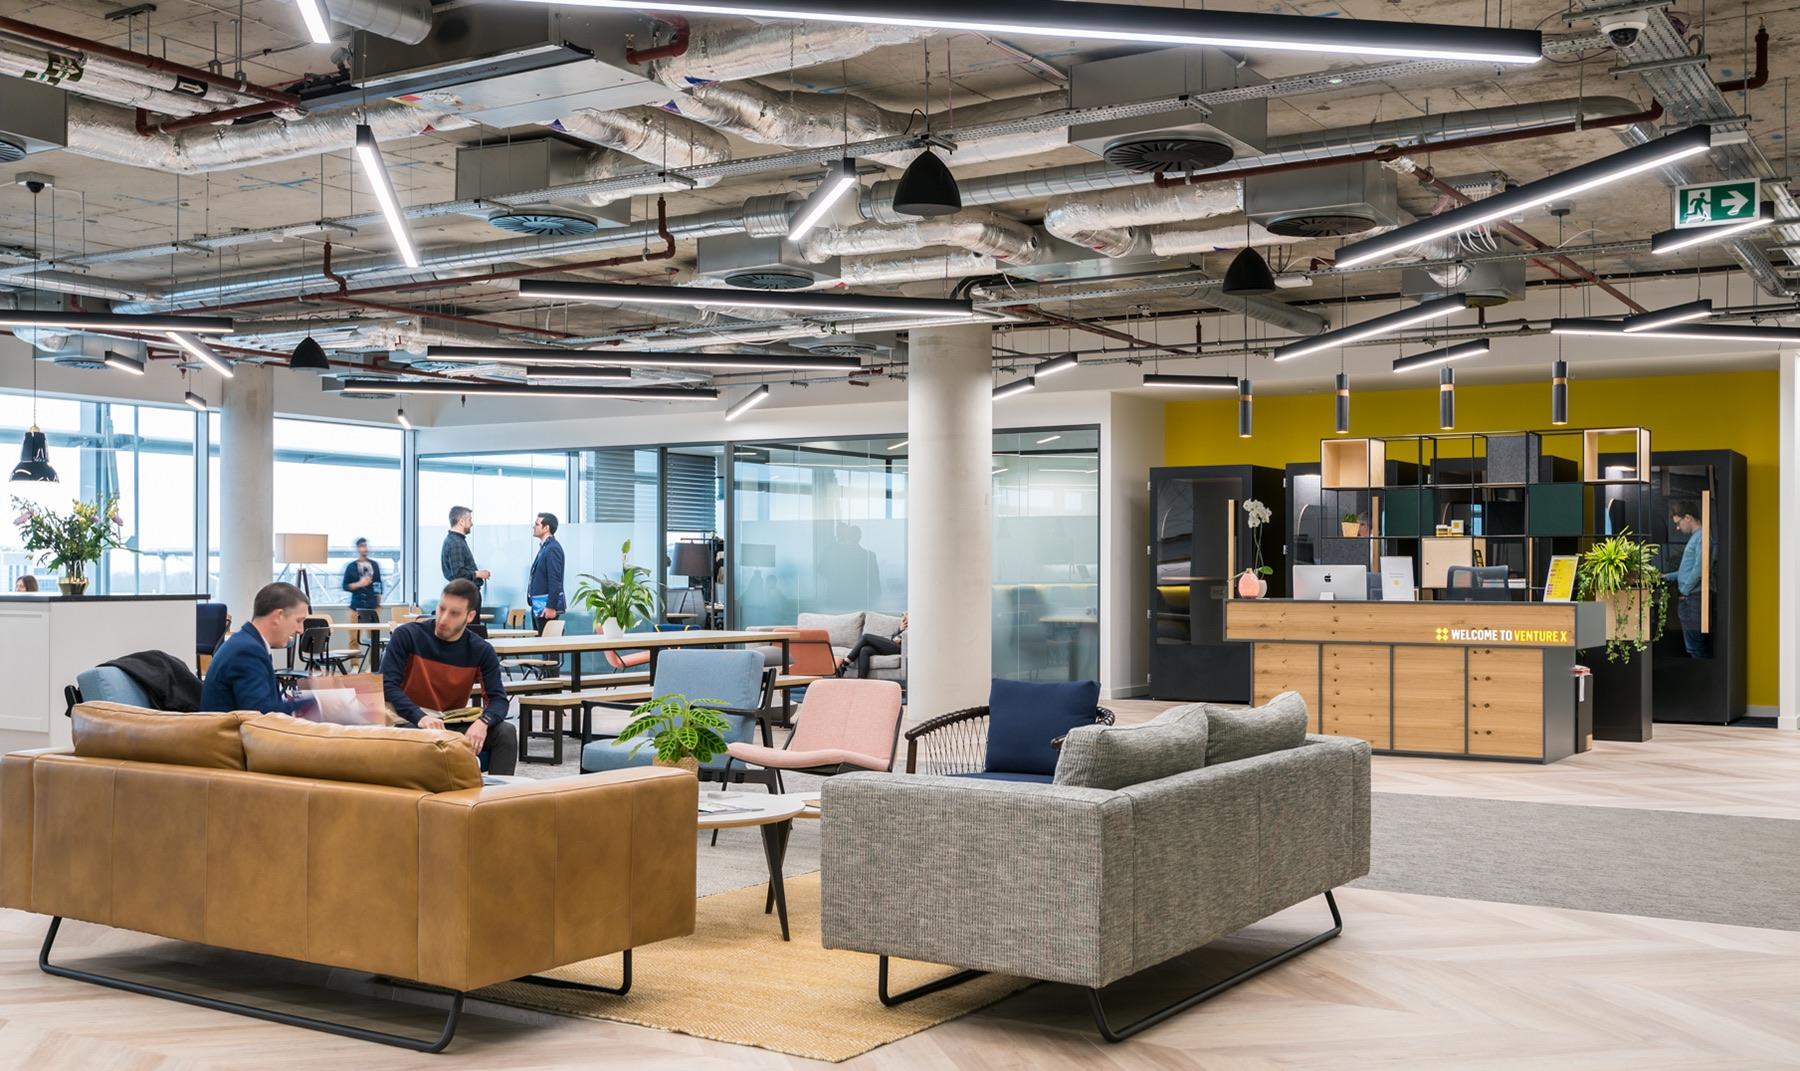 A Look Inside Venture X's New London Office